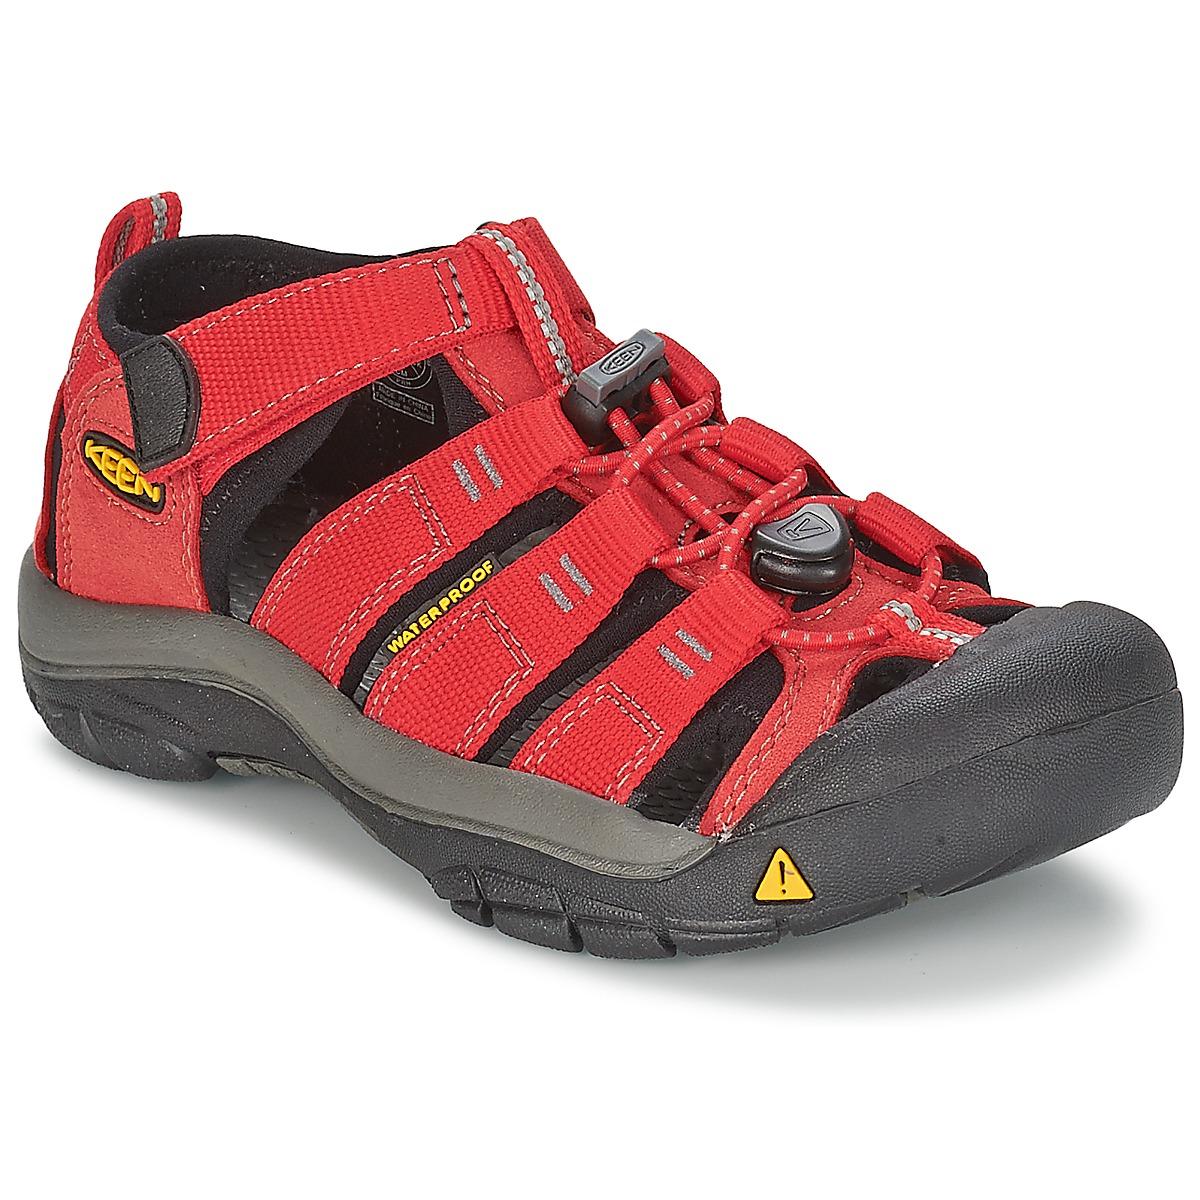 Keen KIDS NEWPORT H2 Rot / Grau - Kostenloser Versand bei Spartoode ! - Schuhe Sportliche Sandalen Kind 36,00 €